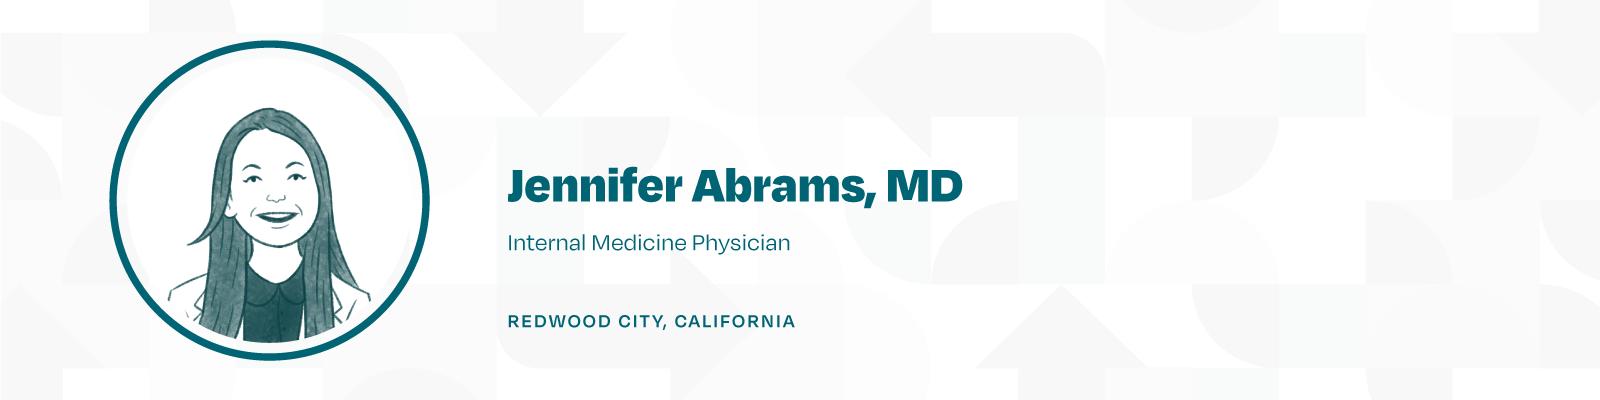 Jennifer Abrams, MD, Internal Medicine Physician